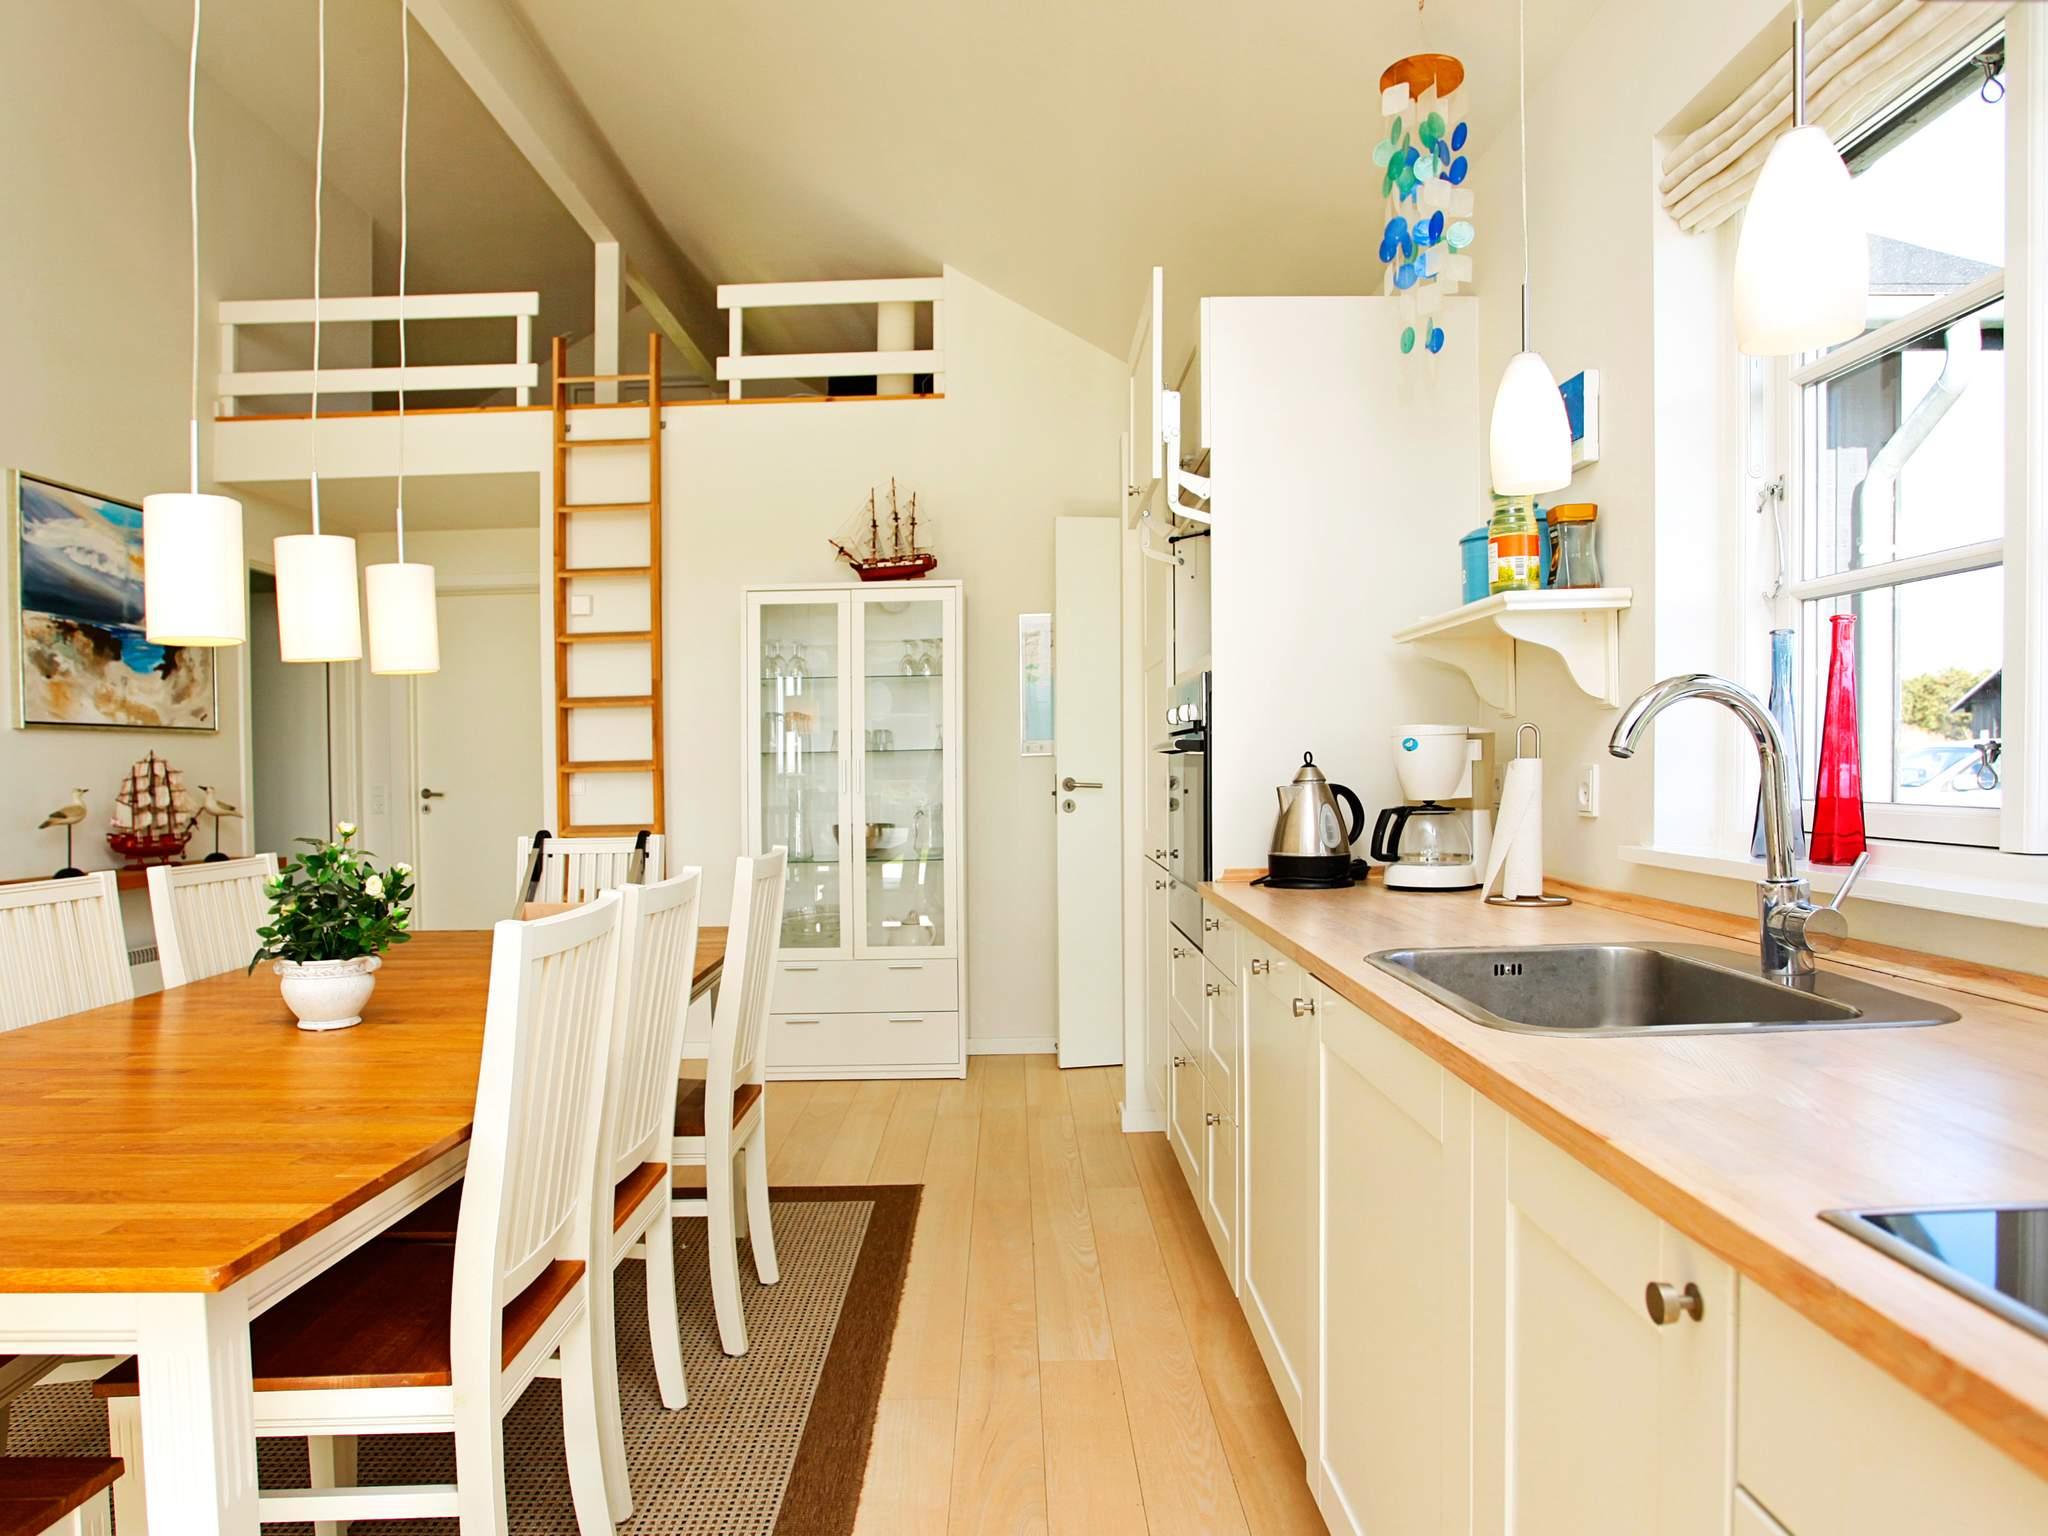 Ferienhaus Nysted (222098), Nysted, , Lolland, Dänemark, Bild 5